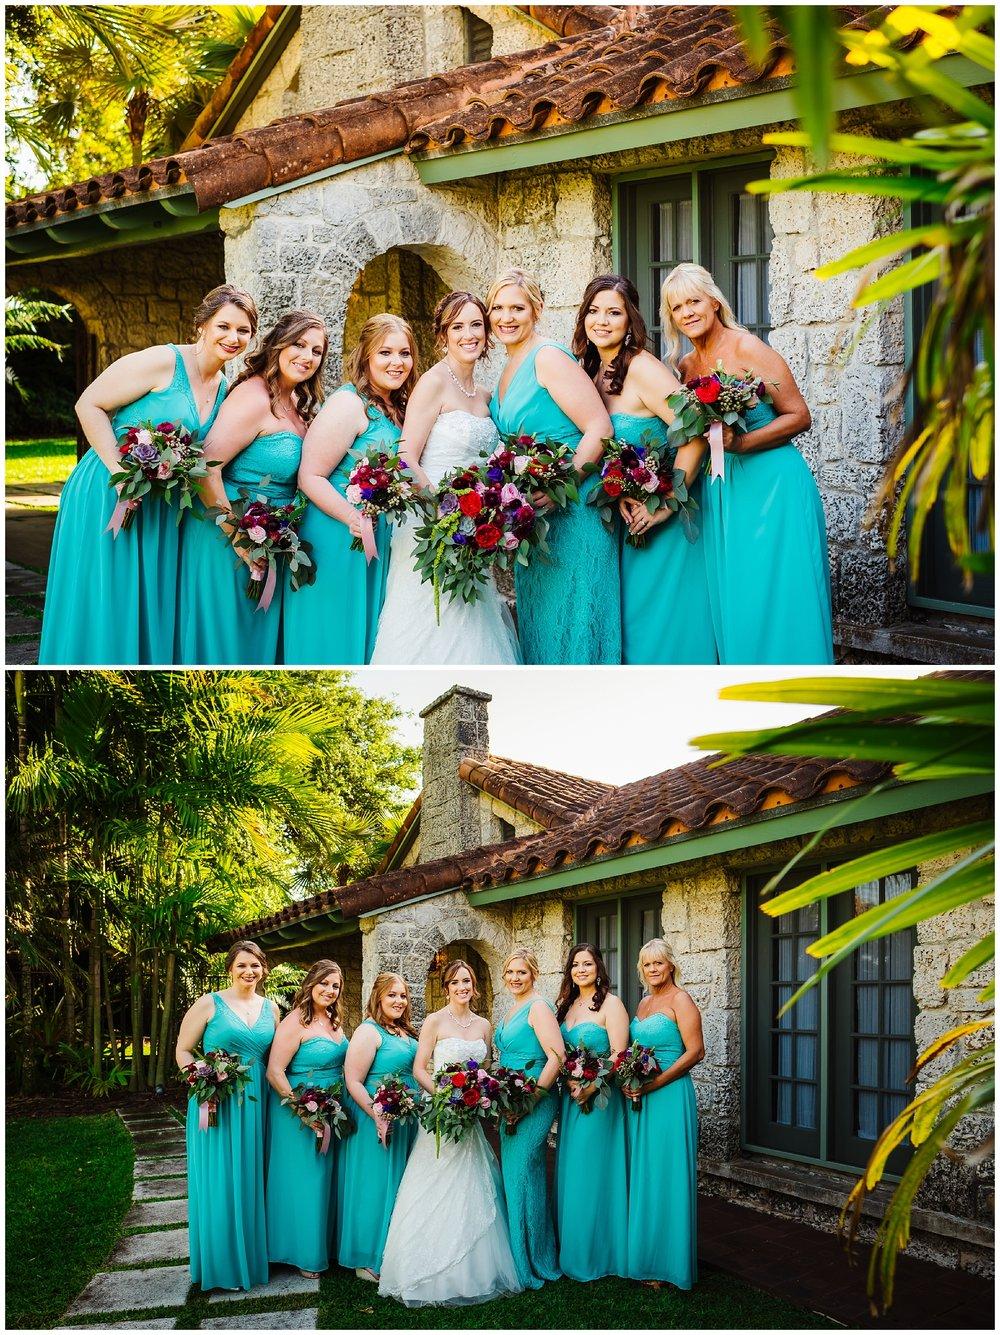 florida-destination-wedding-photographer-enchanted-tropical-miami-homestead-cooper-estate-teal_0035.jpg